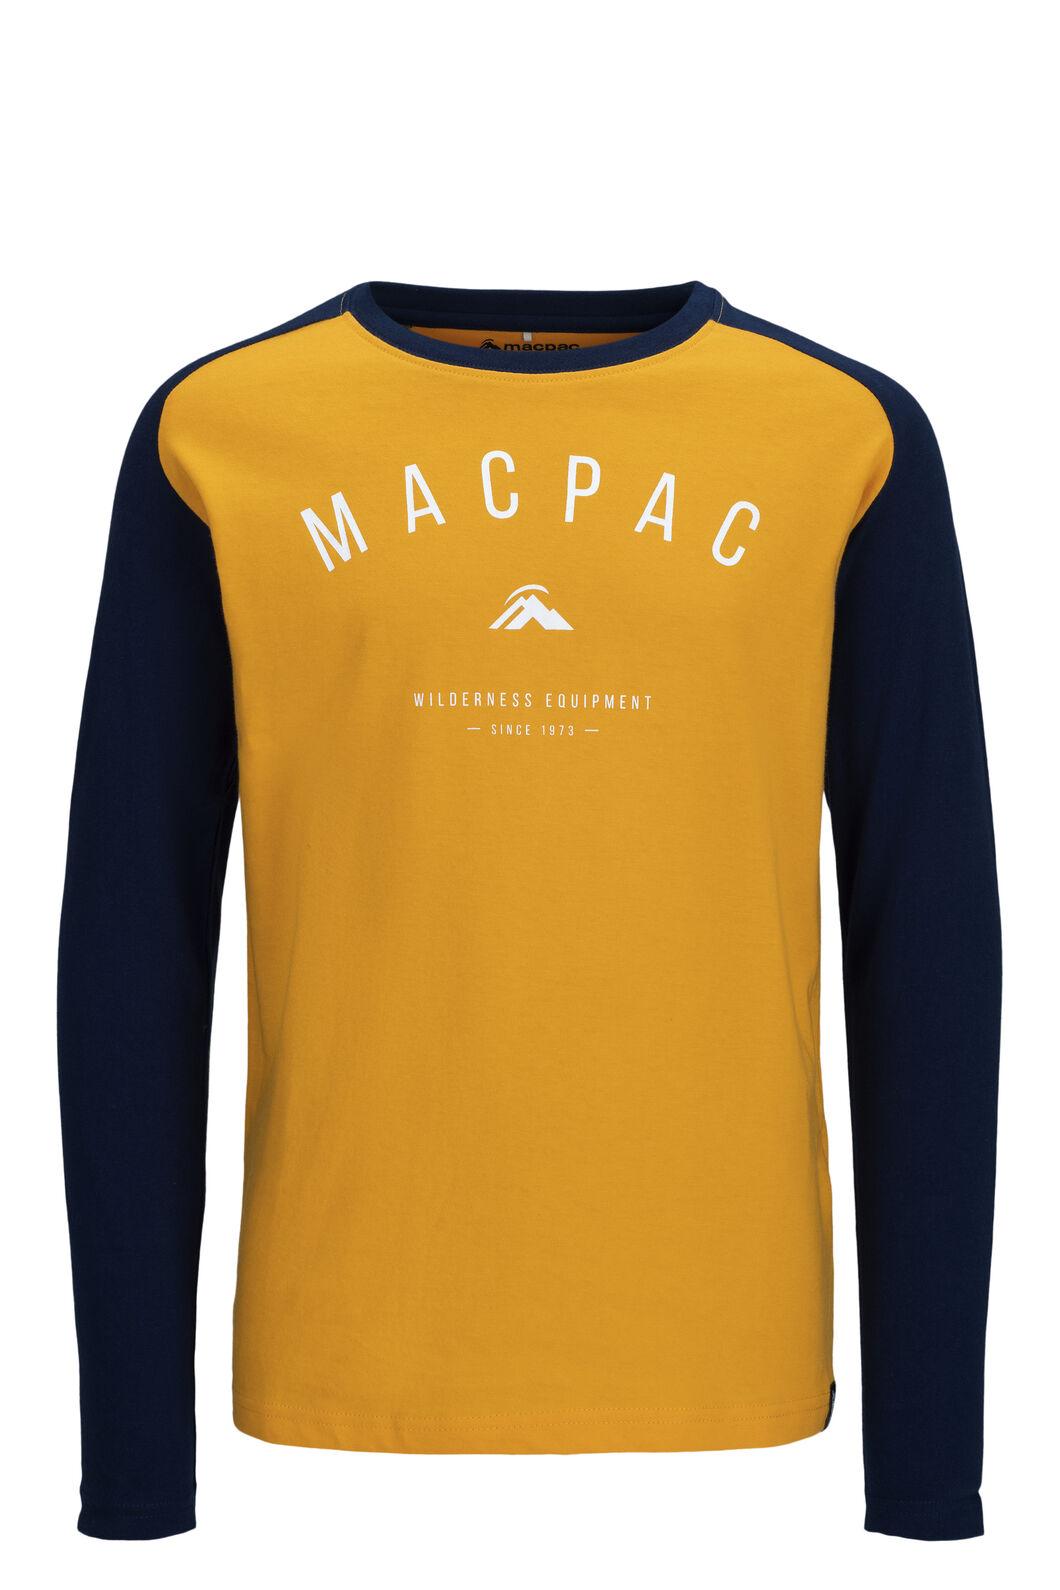 Macpac Graphic Fairtrade Organic Cotton Long Sleeve Tee — Kids', Cadmium Yellow/Black Iris, hi-res